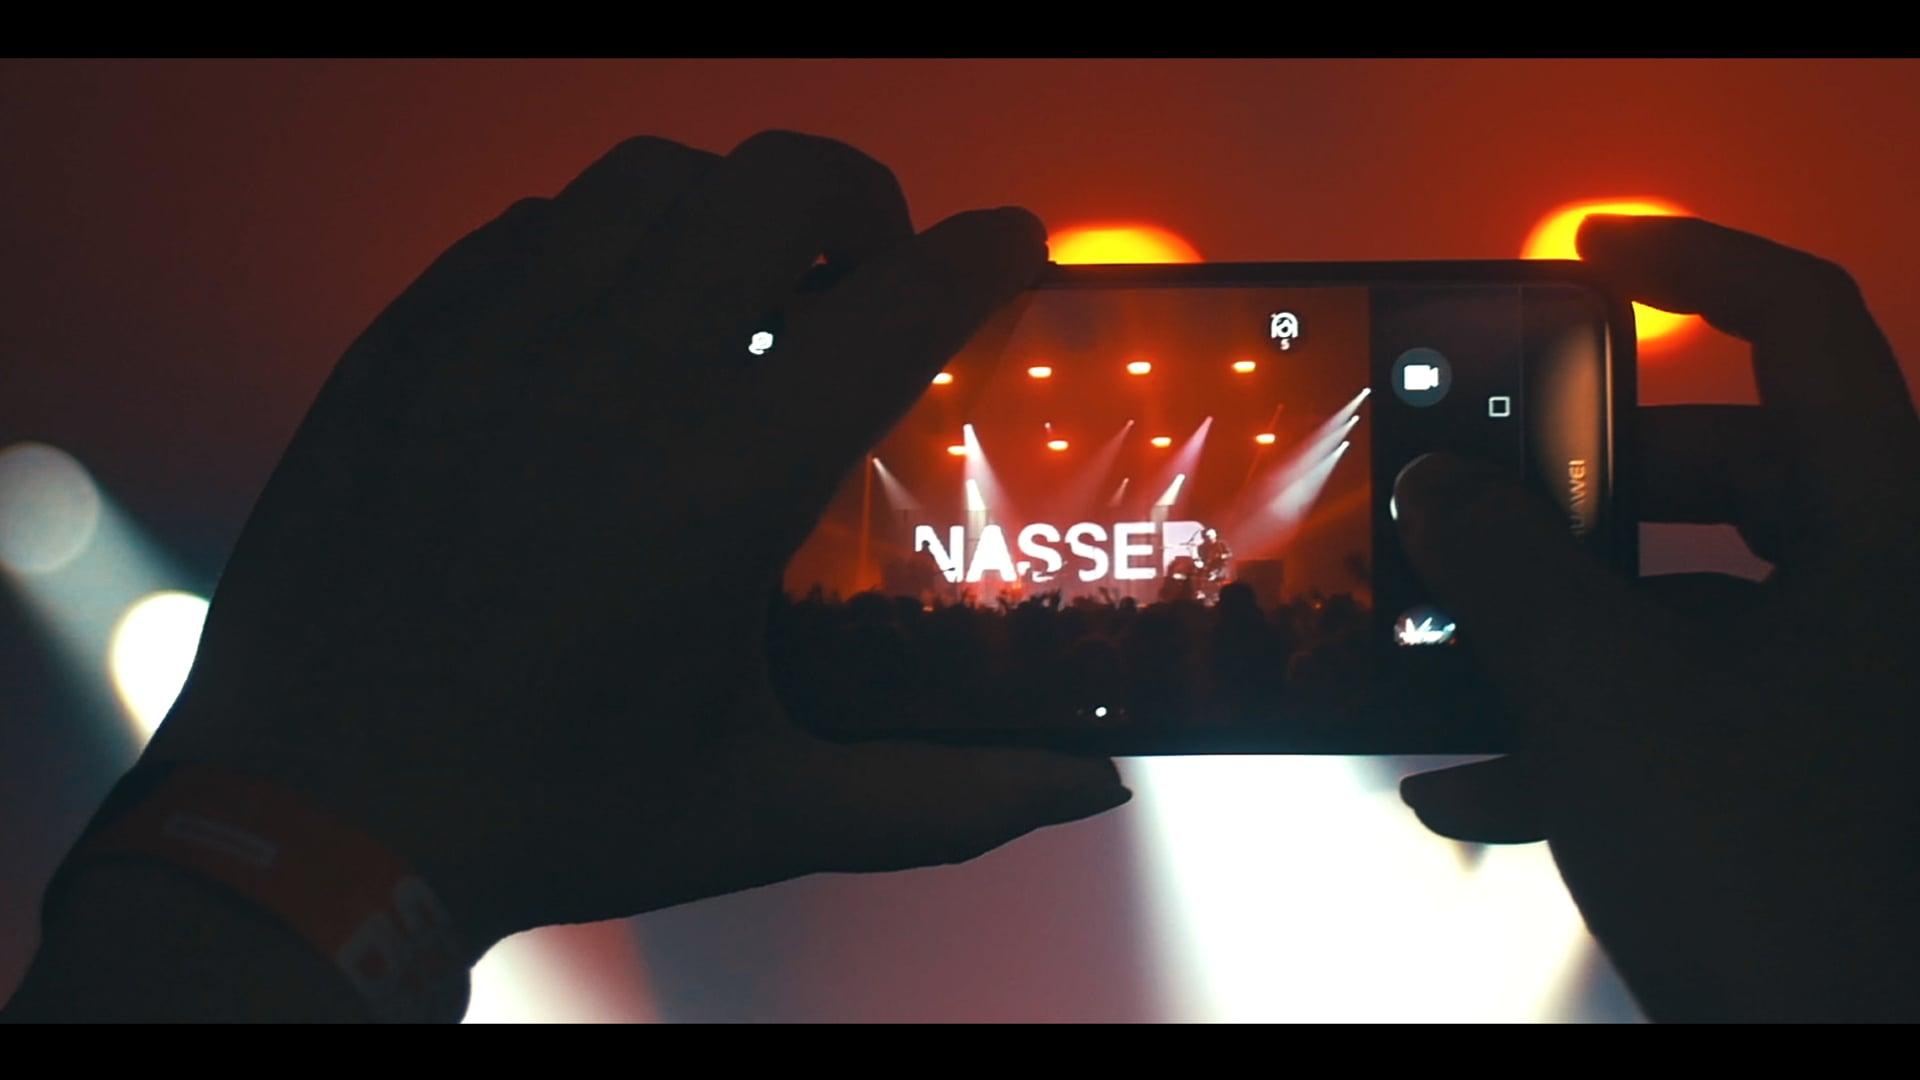 NASSER - Solidays 2018 (Paris)